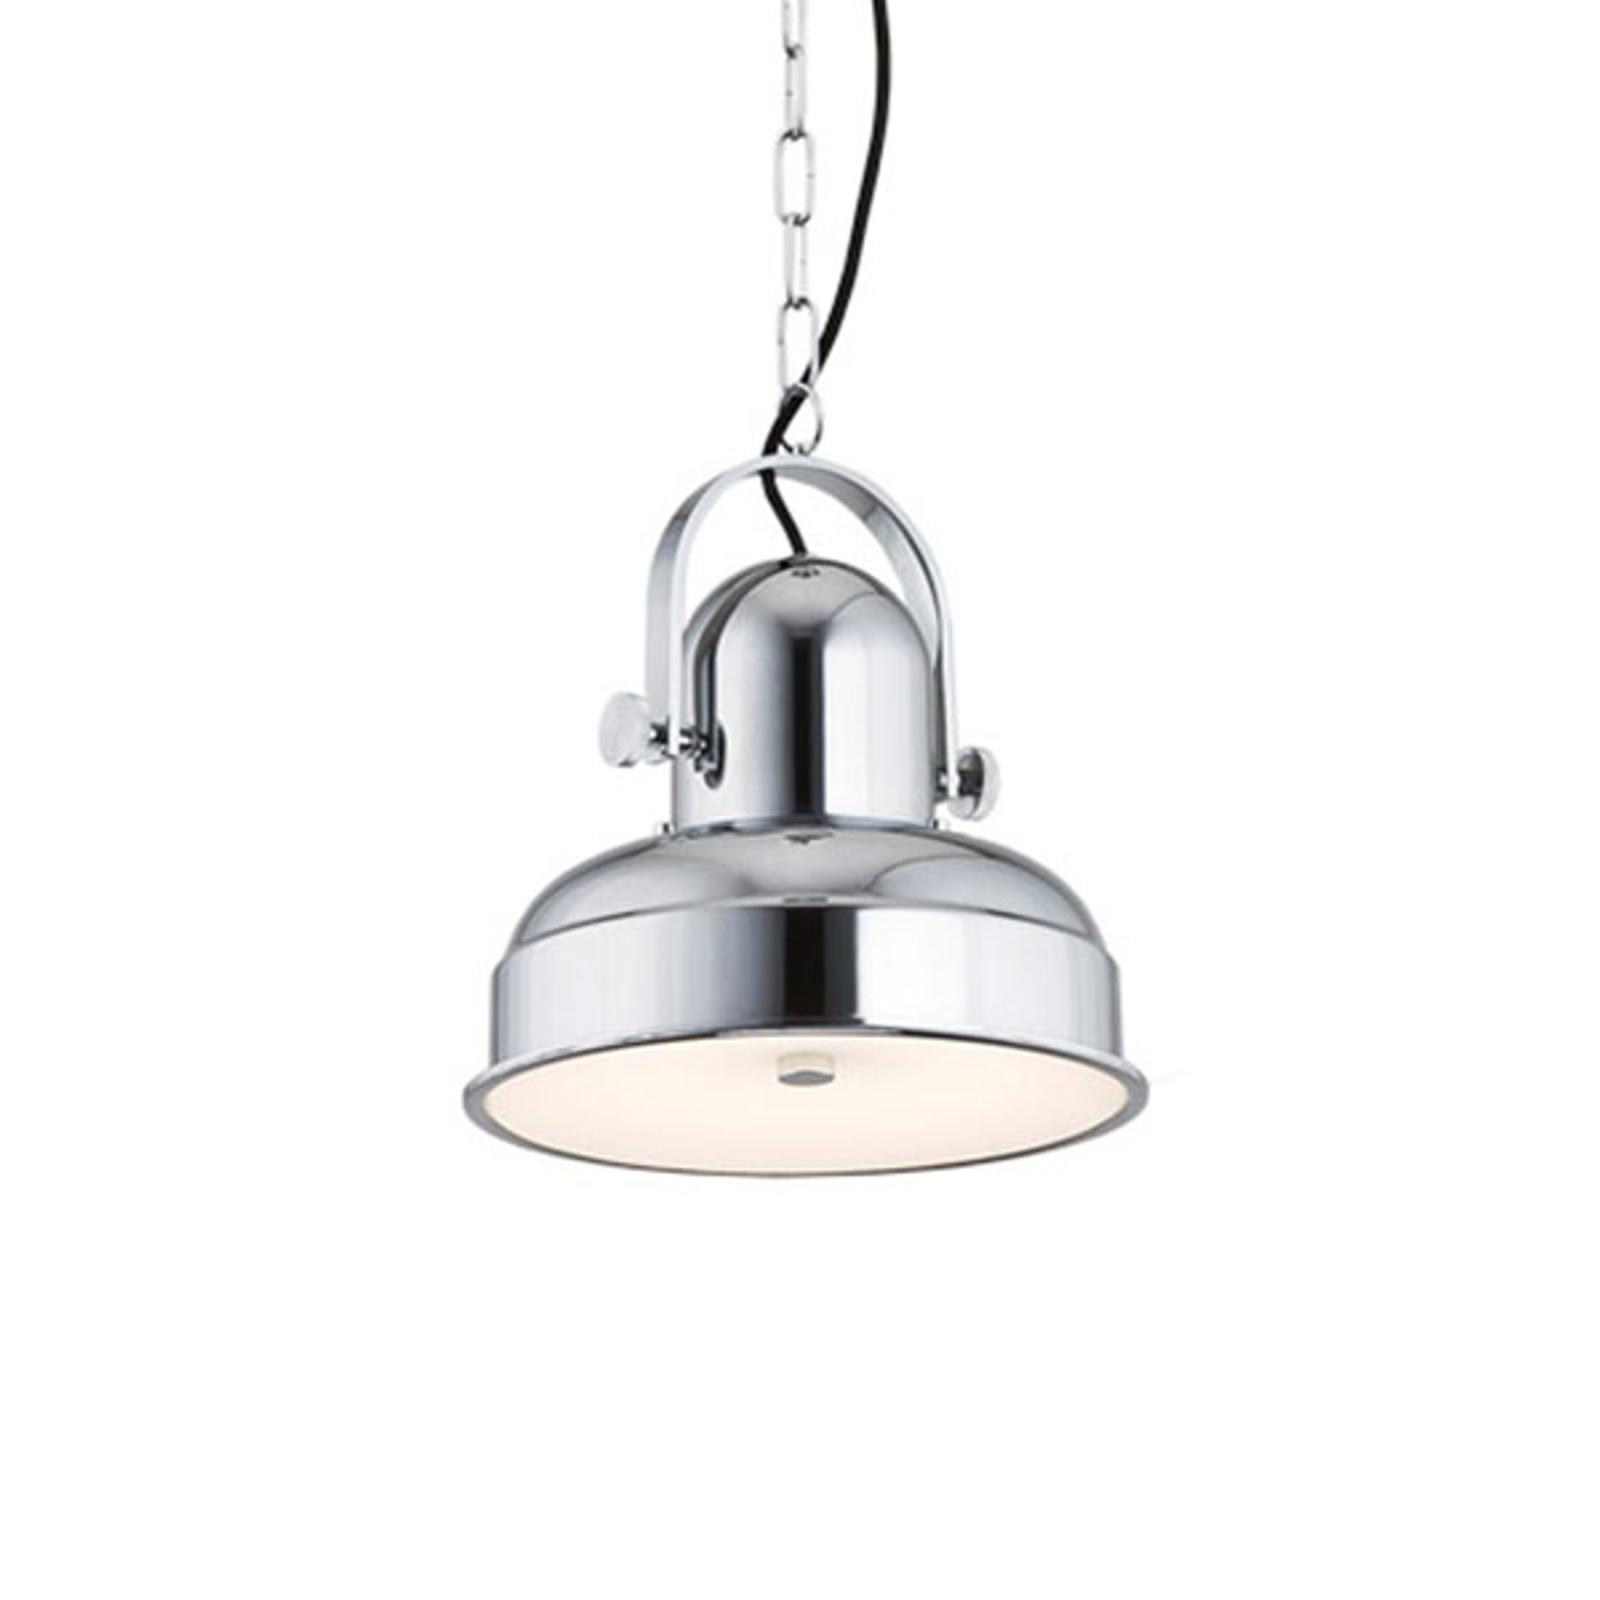 LED-hengelampe Forada, krom